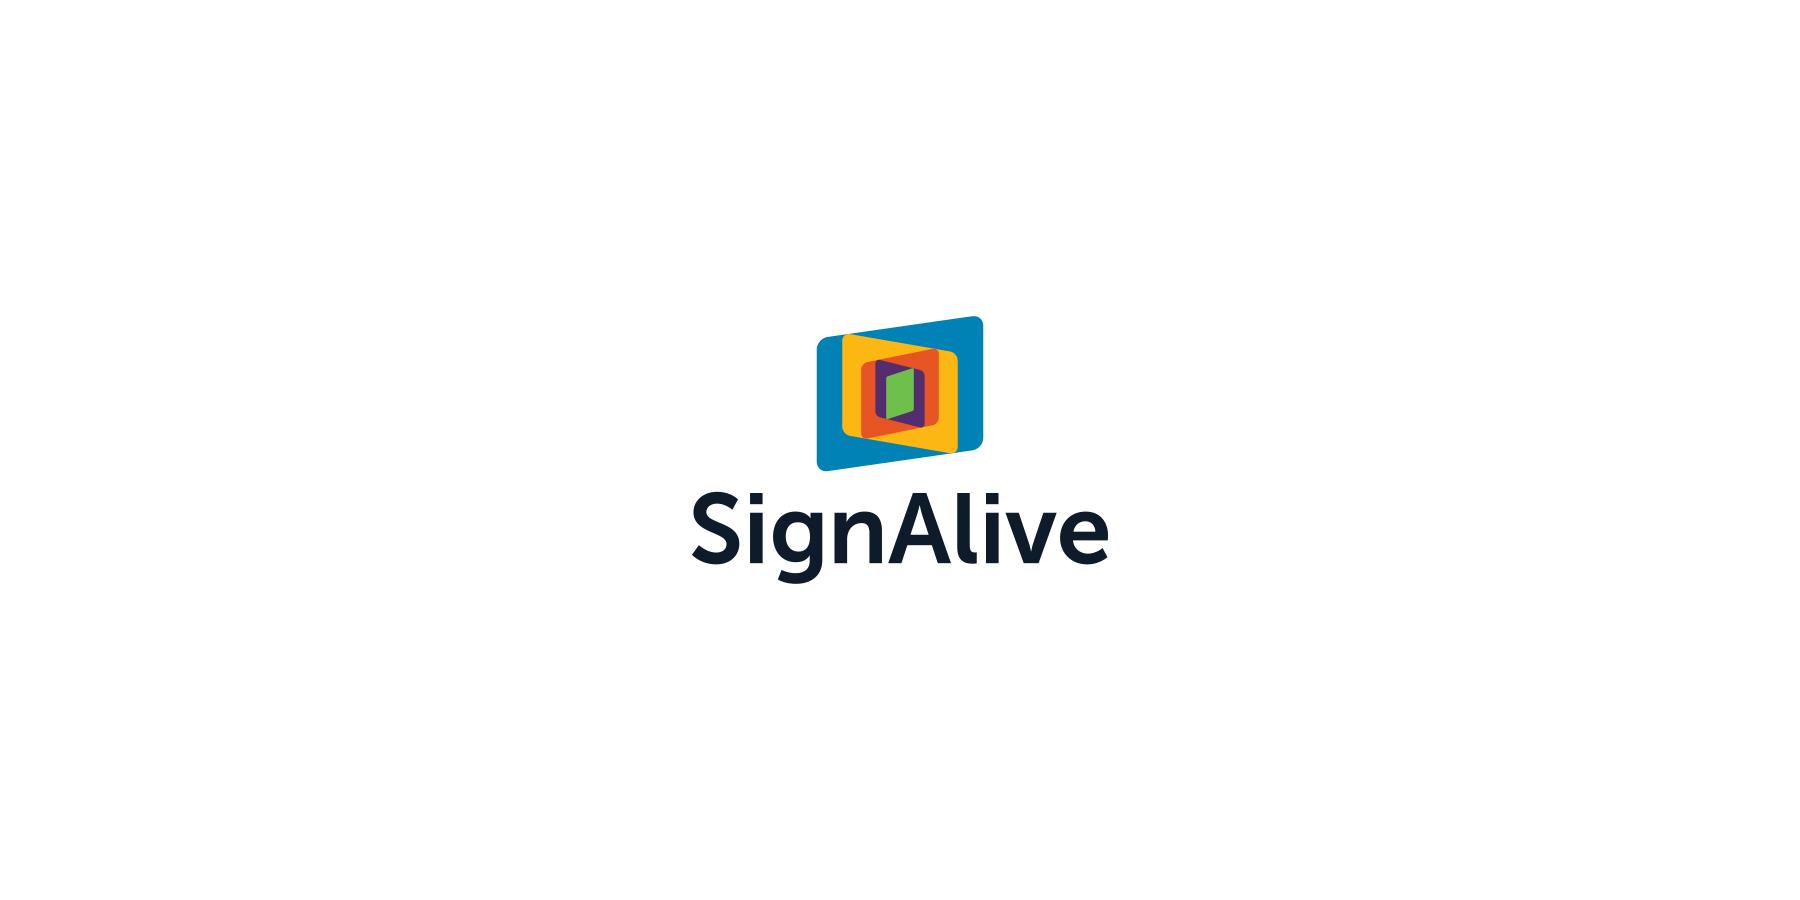 signalive-logo-design-04